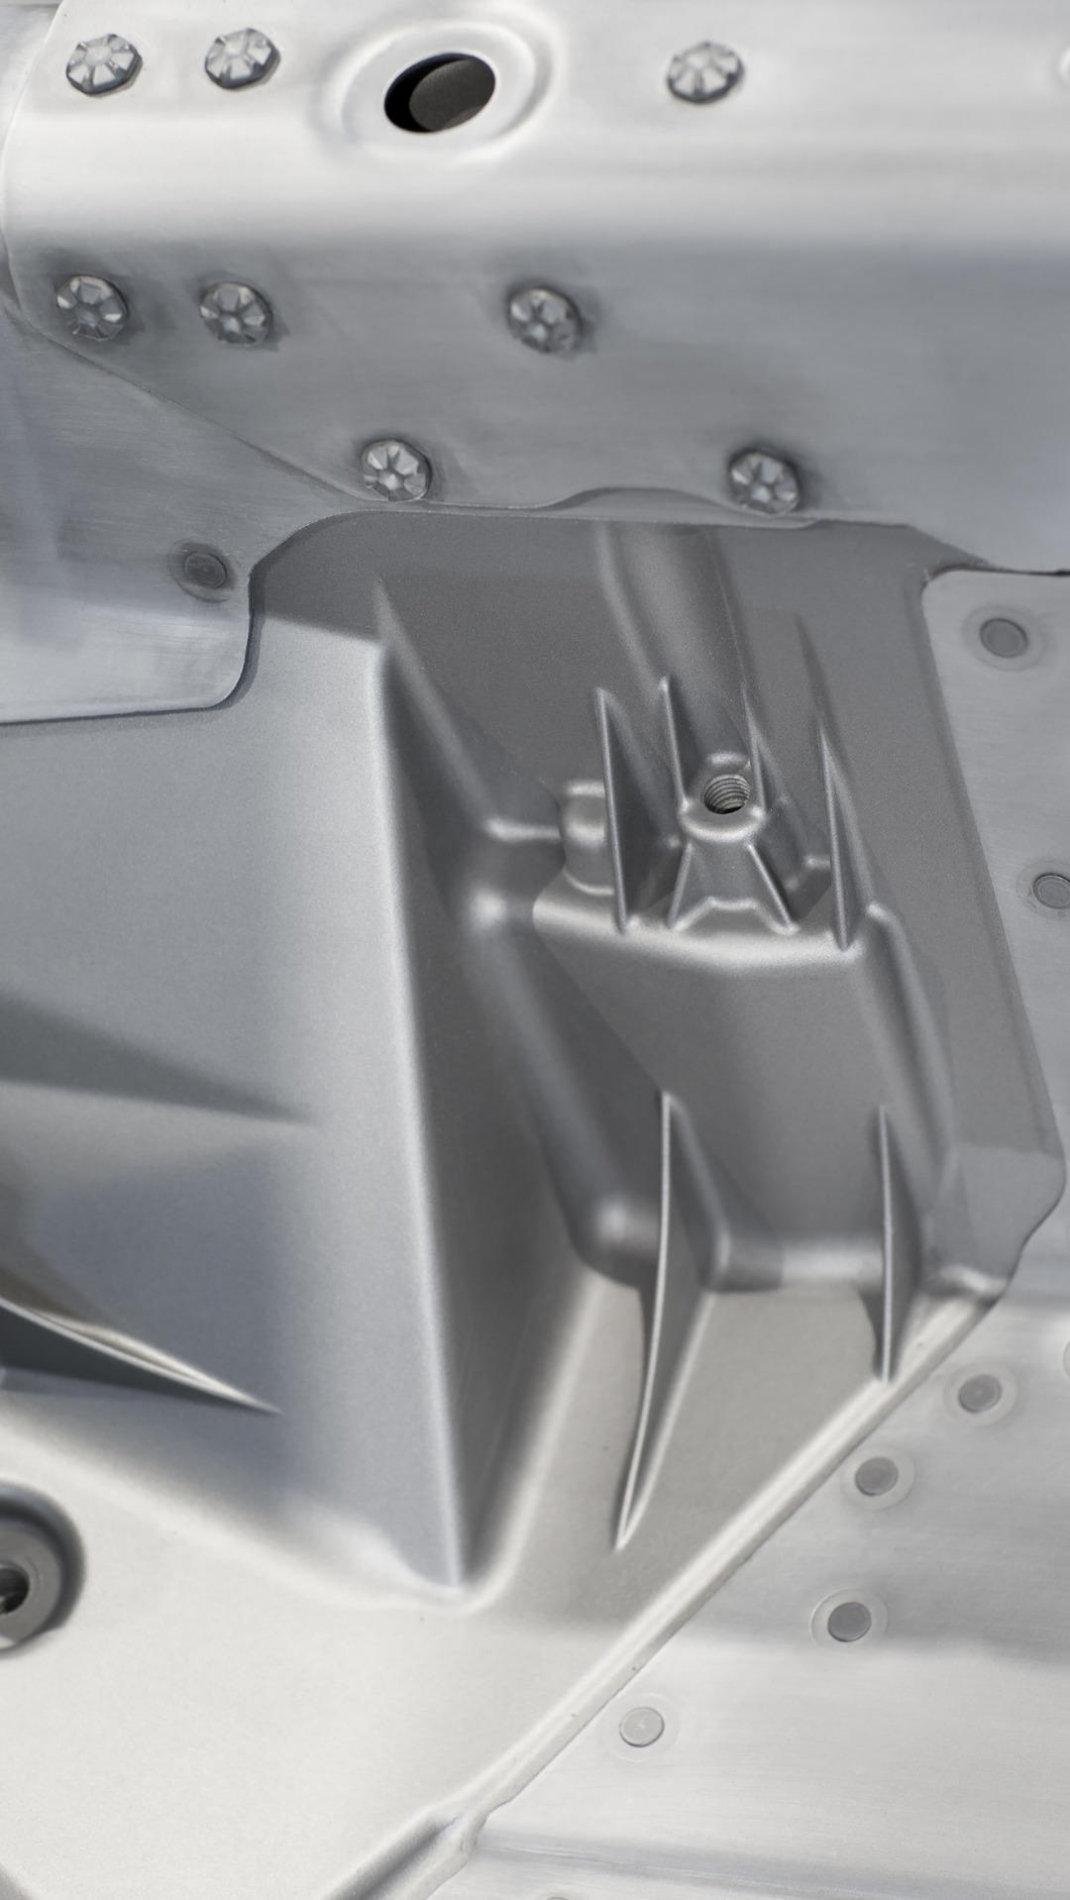 Noua generatie Audi A8 - Noua generatie Audi A8